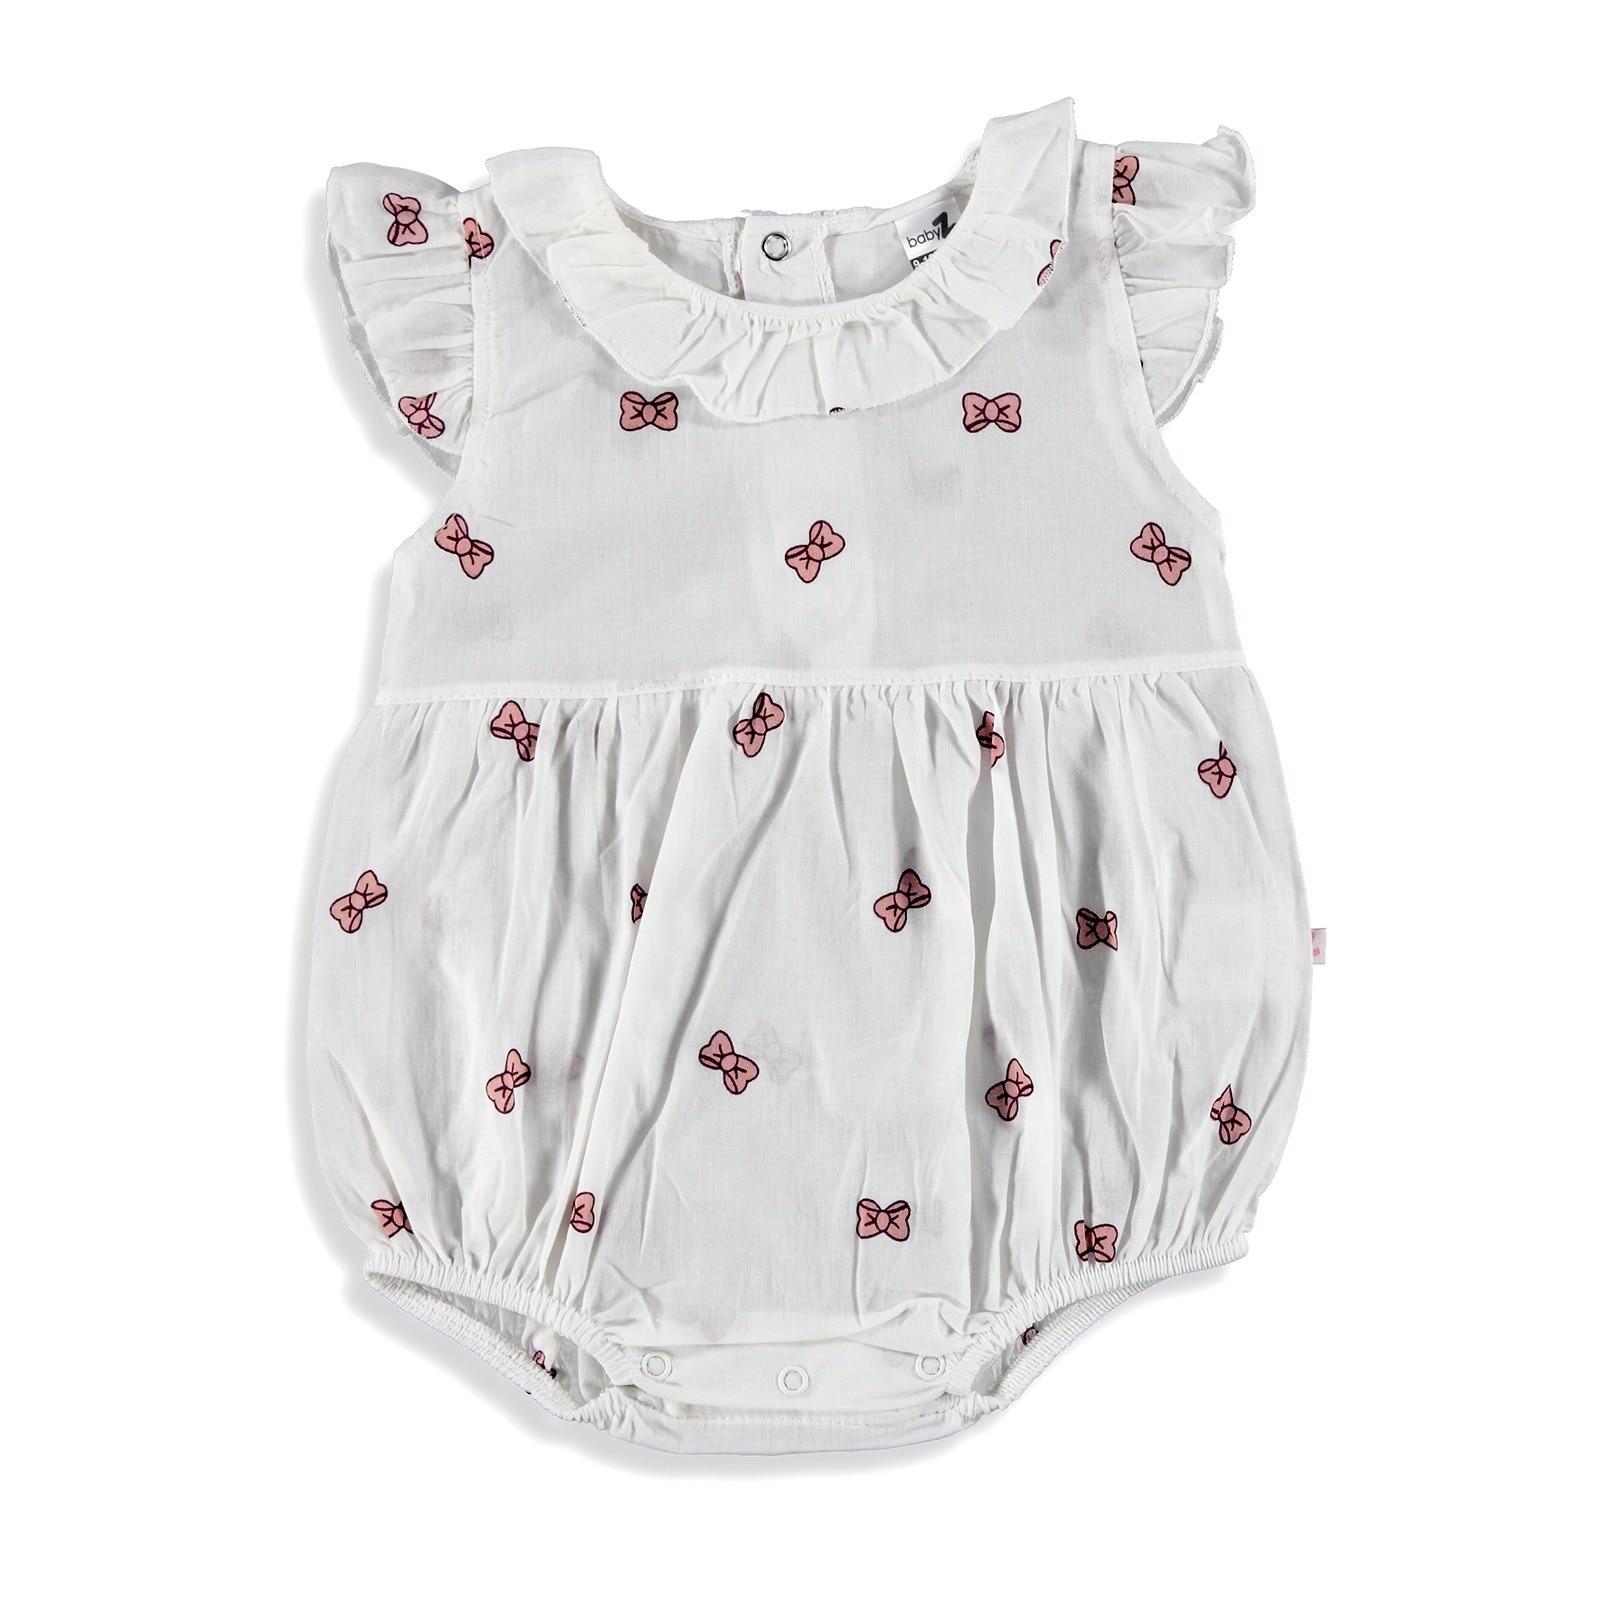 Ebebek BabyZ Bow Printed Baby Girl Short Romper